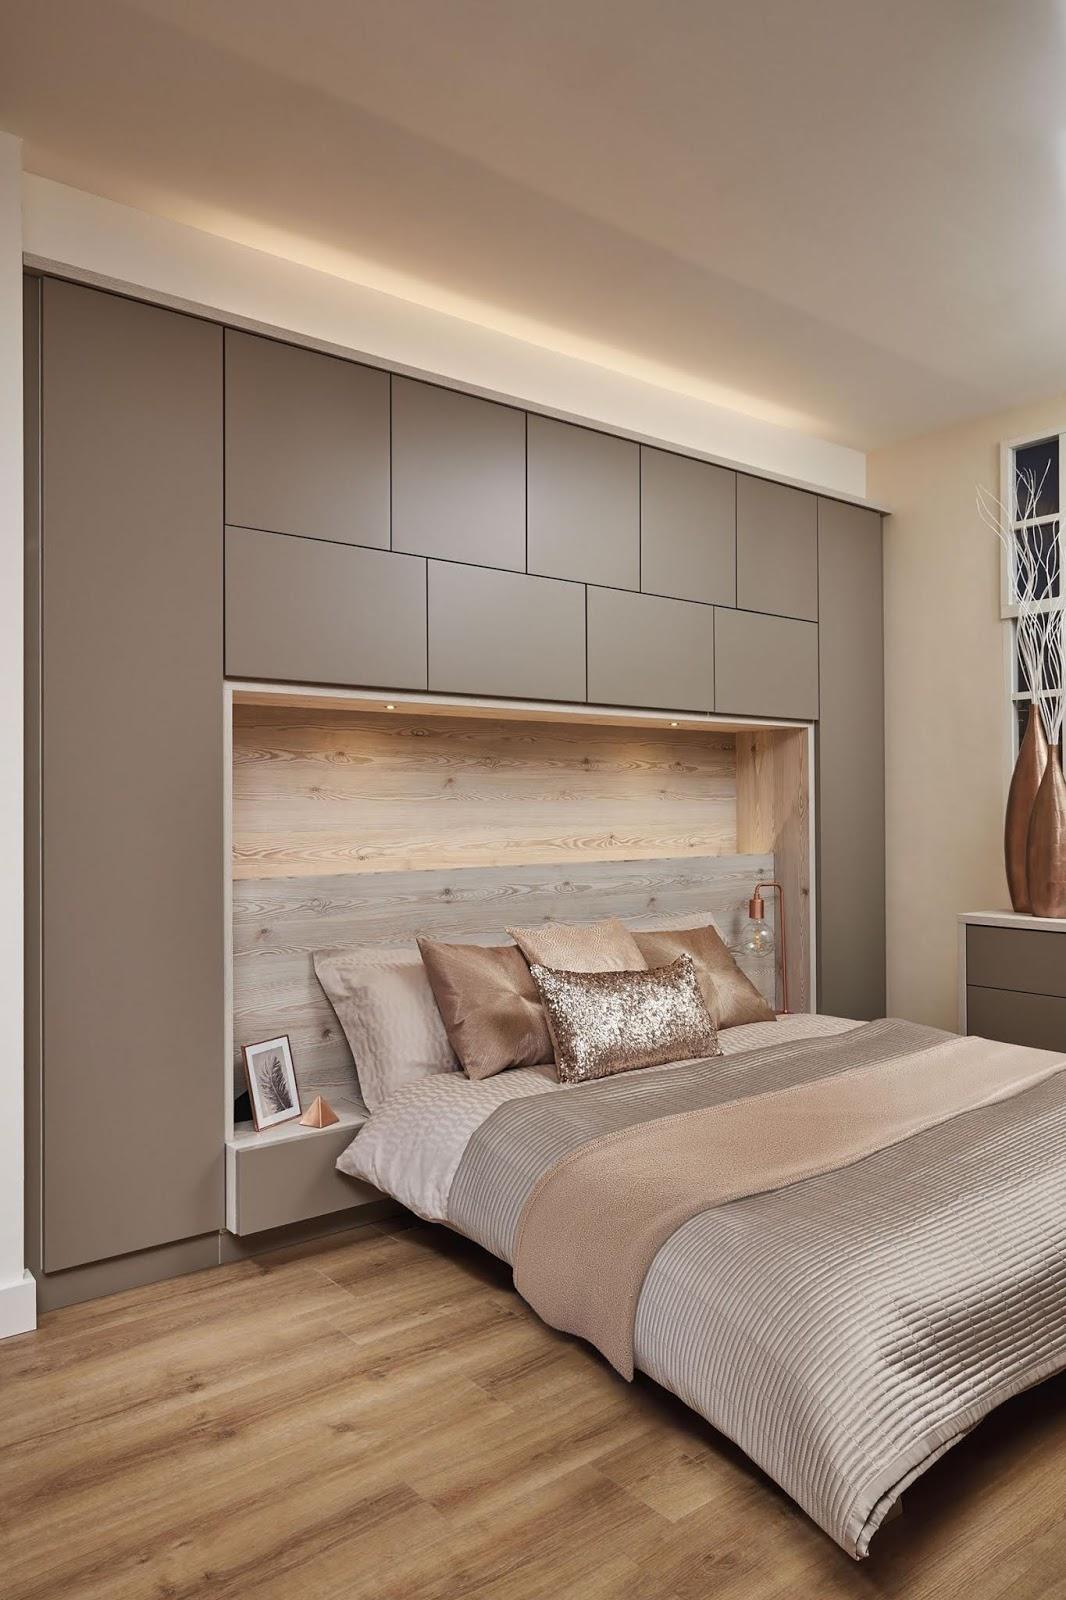 Cozy Minimalist Bedroom Decorating Ideas in 2019